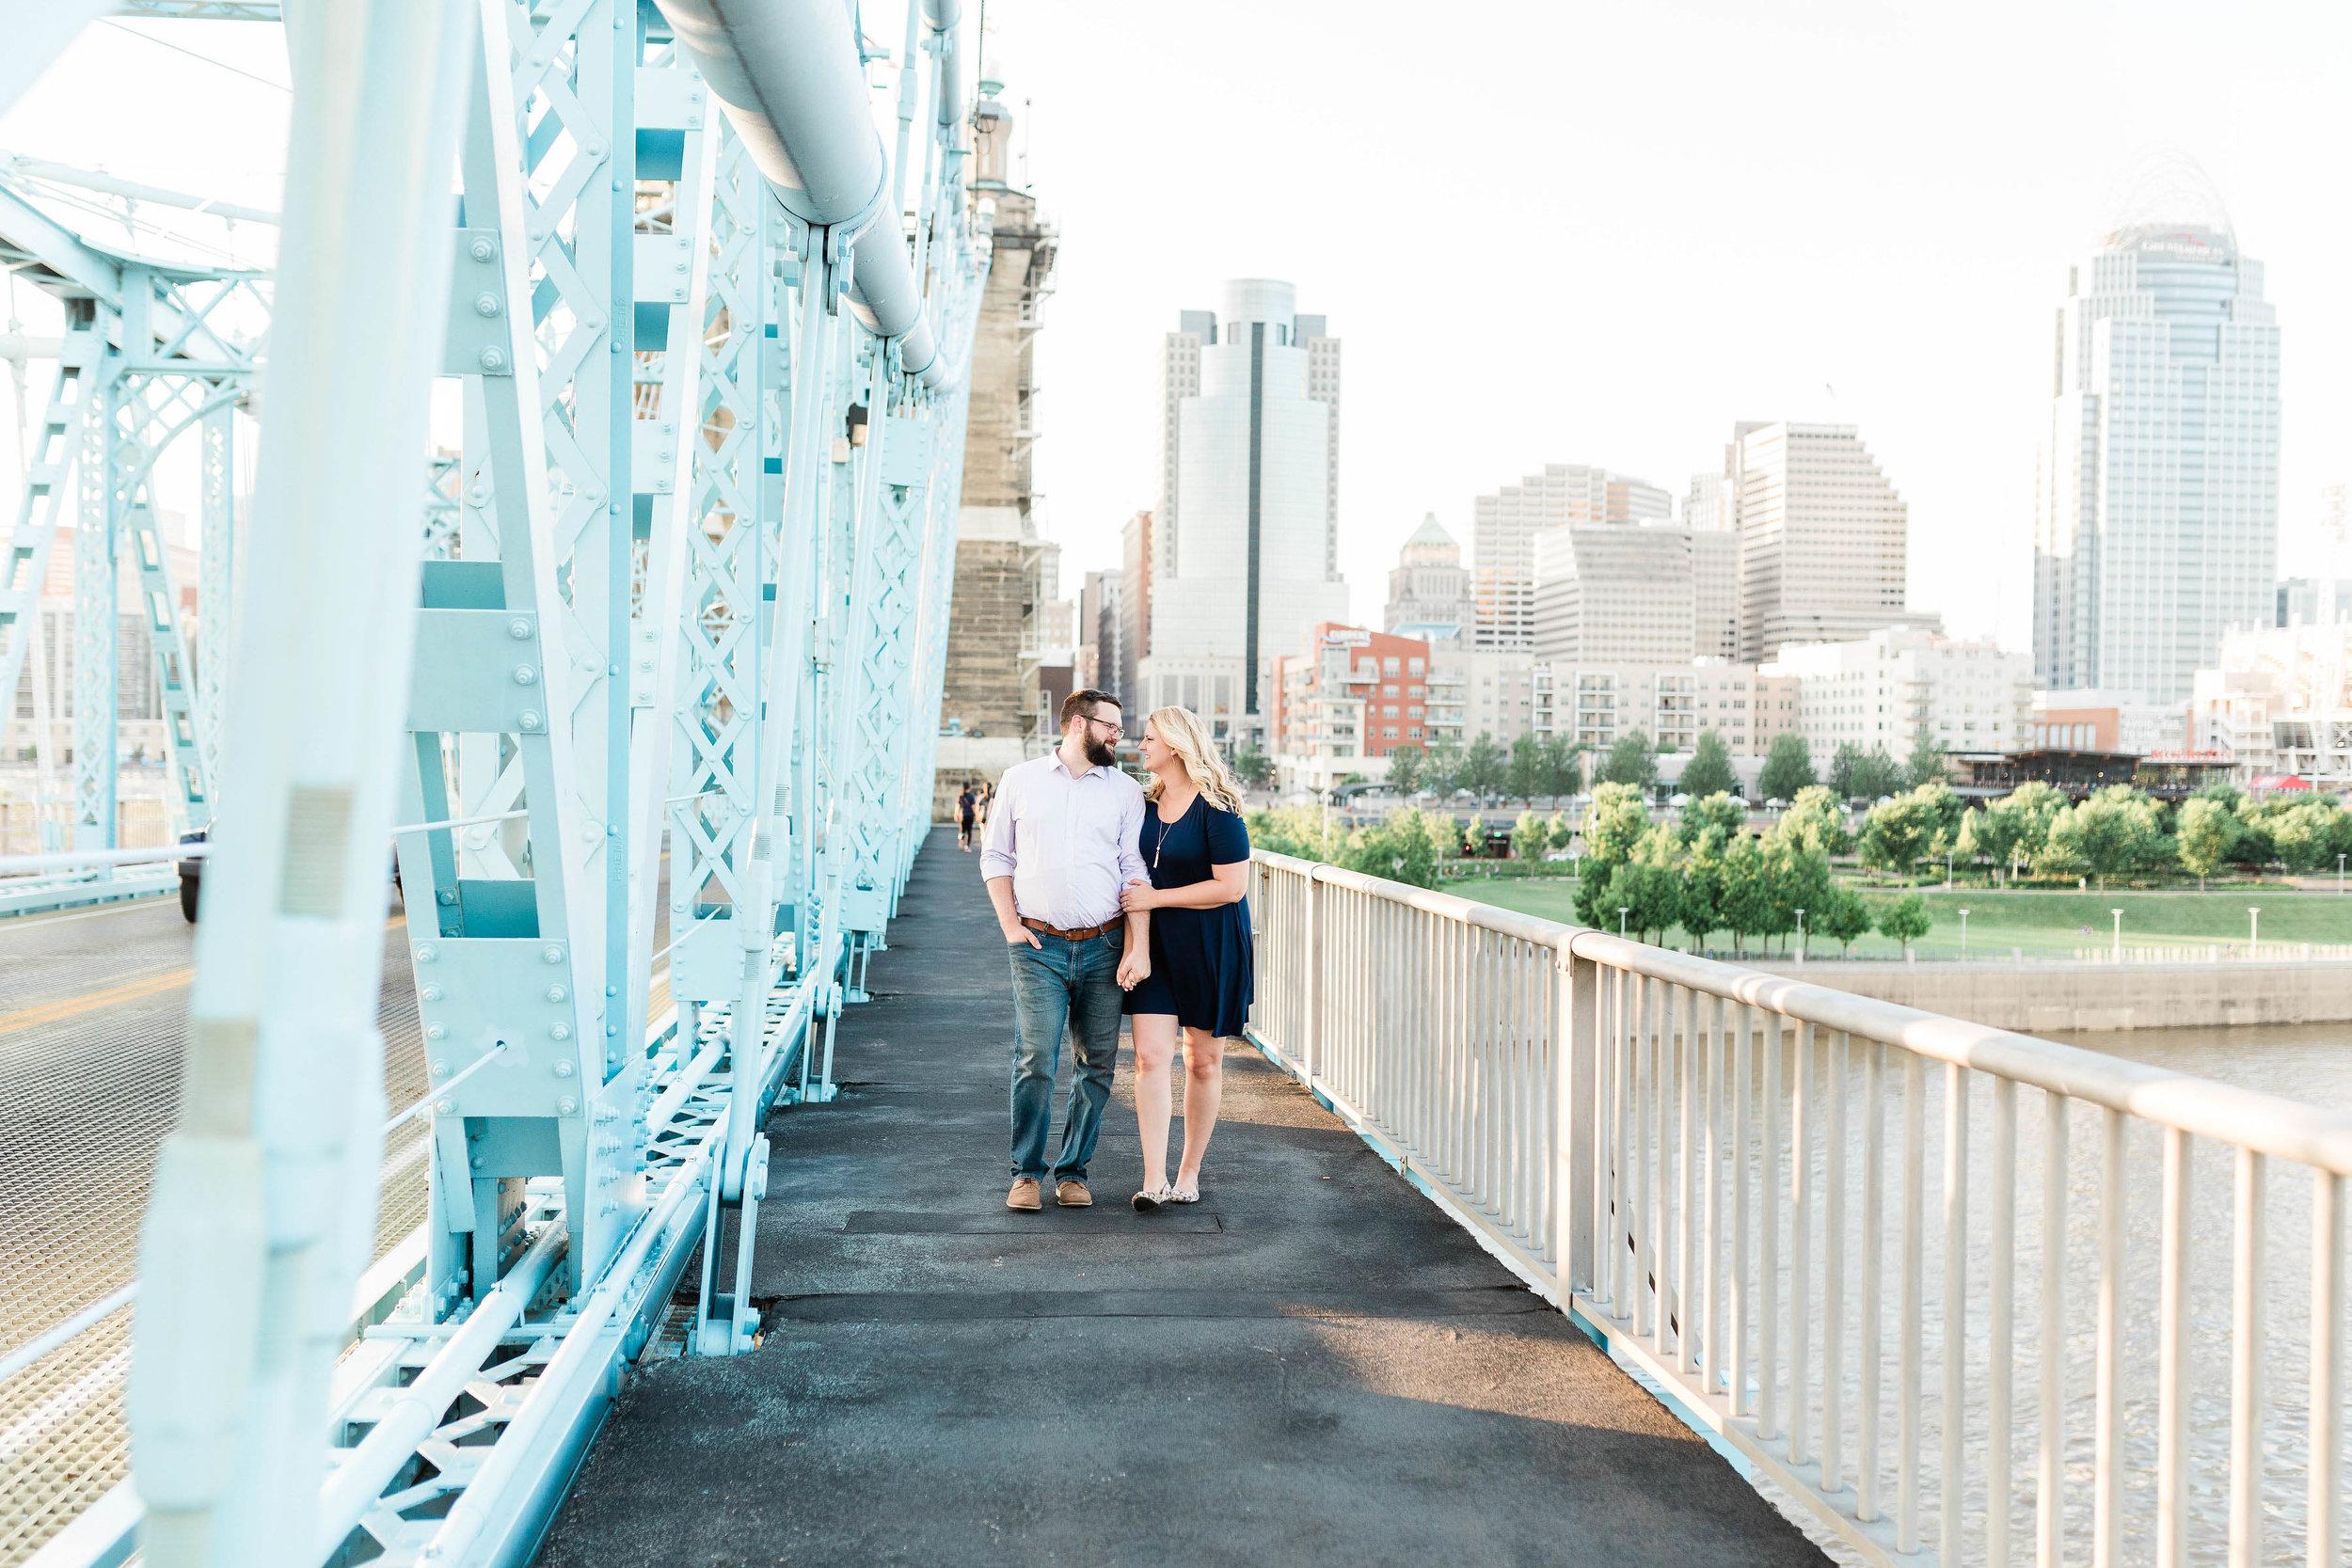 wedding photographer in cincinnati ohio lauren day photography-11.jpg